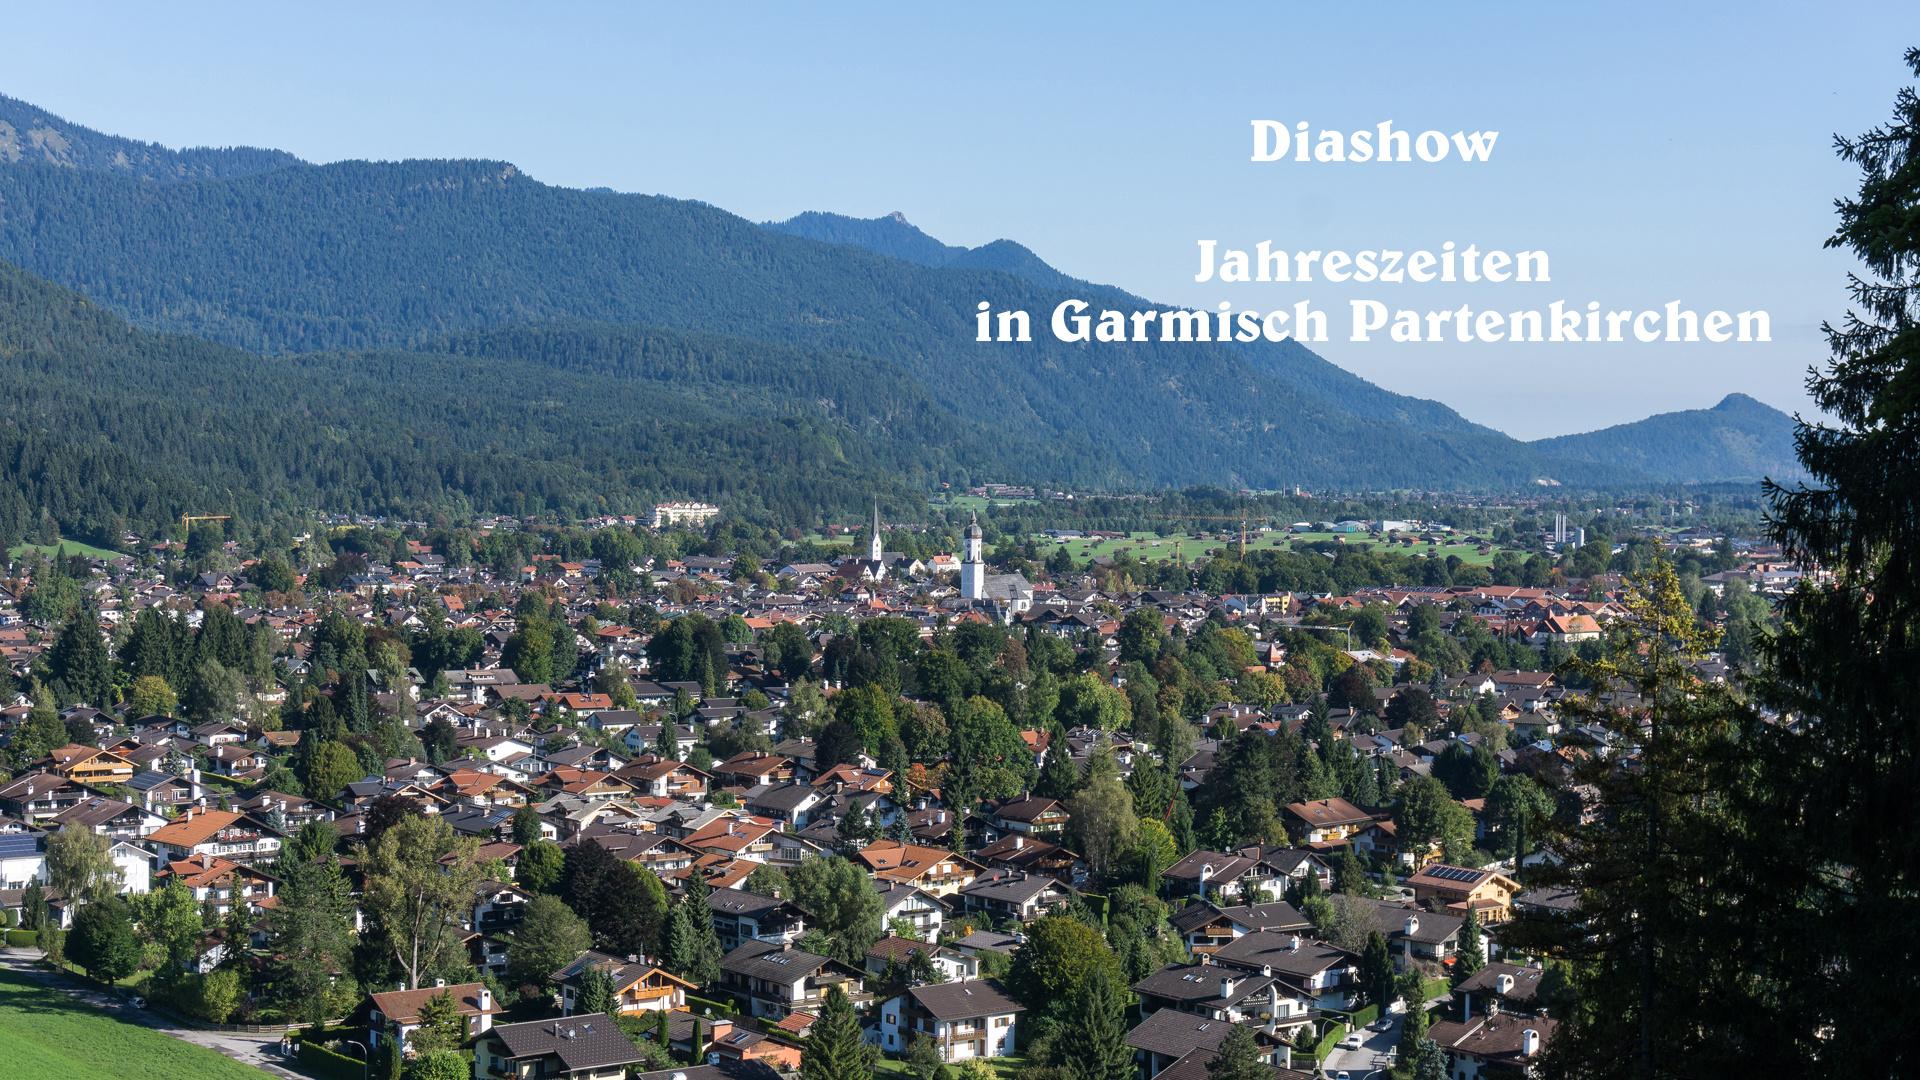 Diashow-Garmisch Partenkirchen